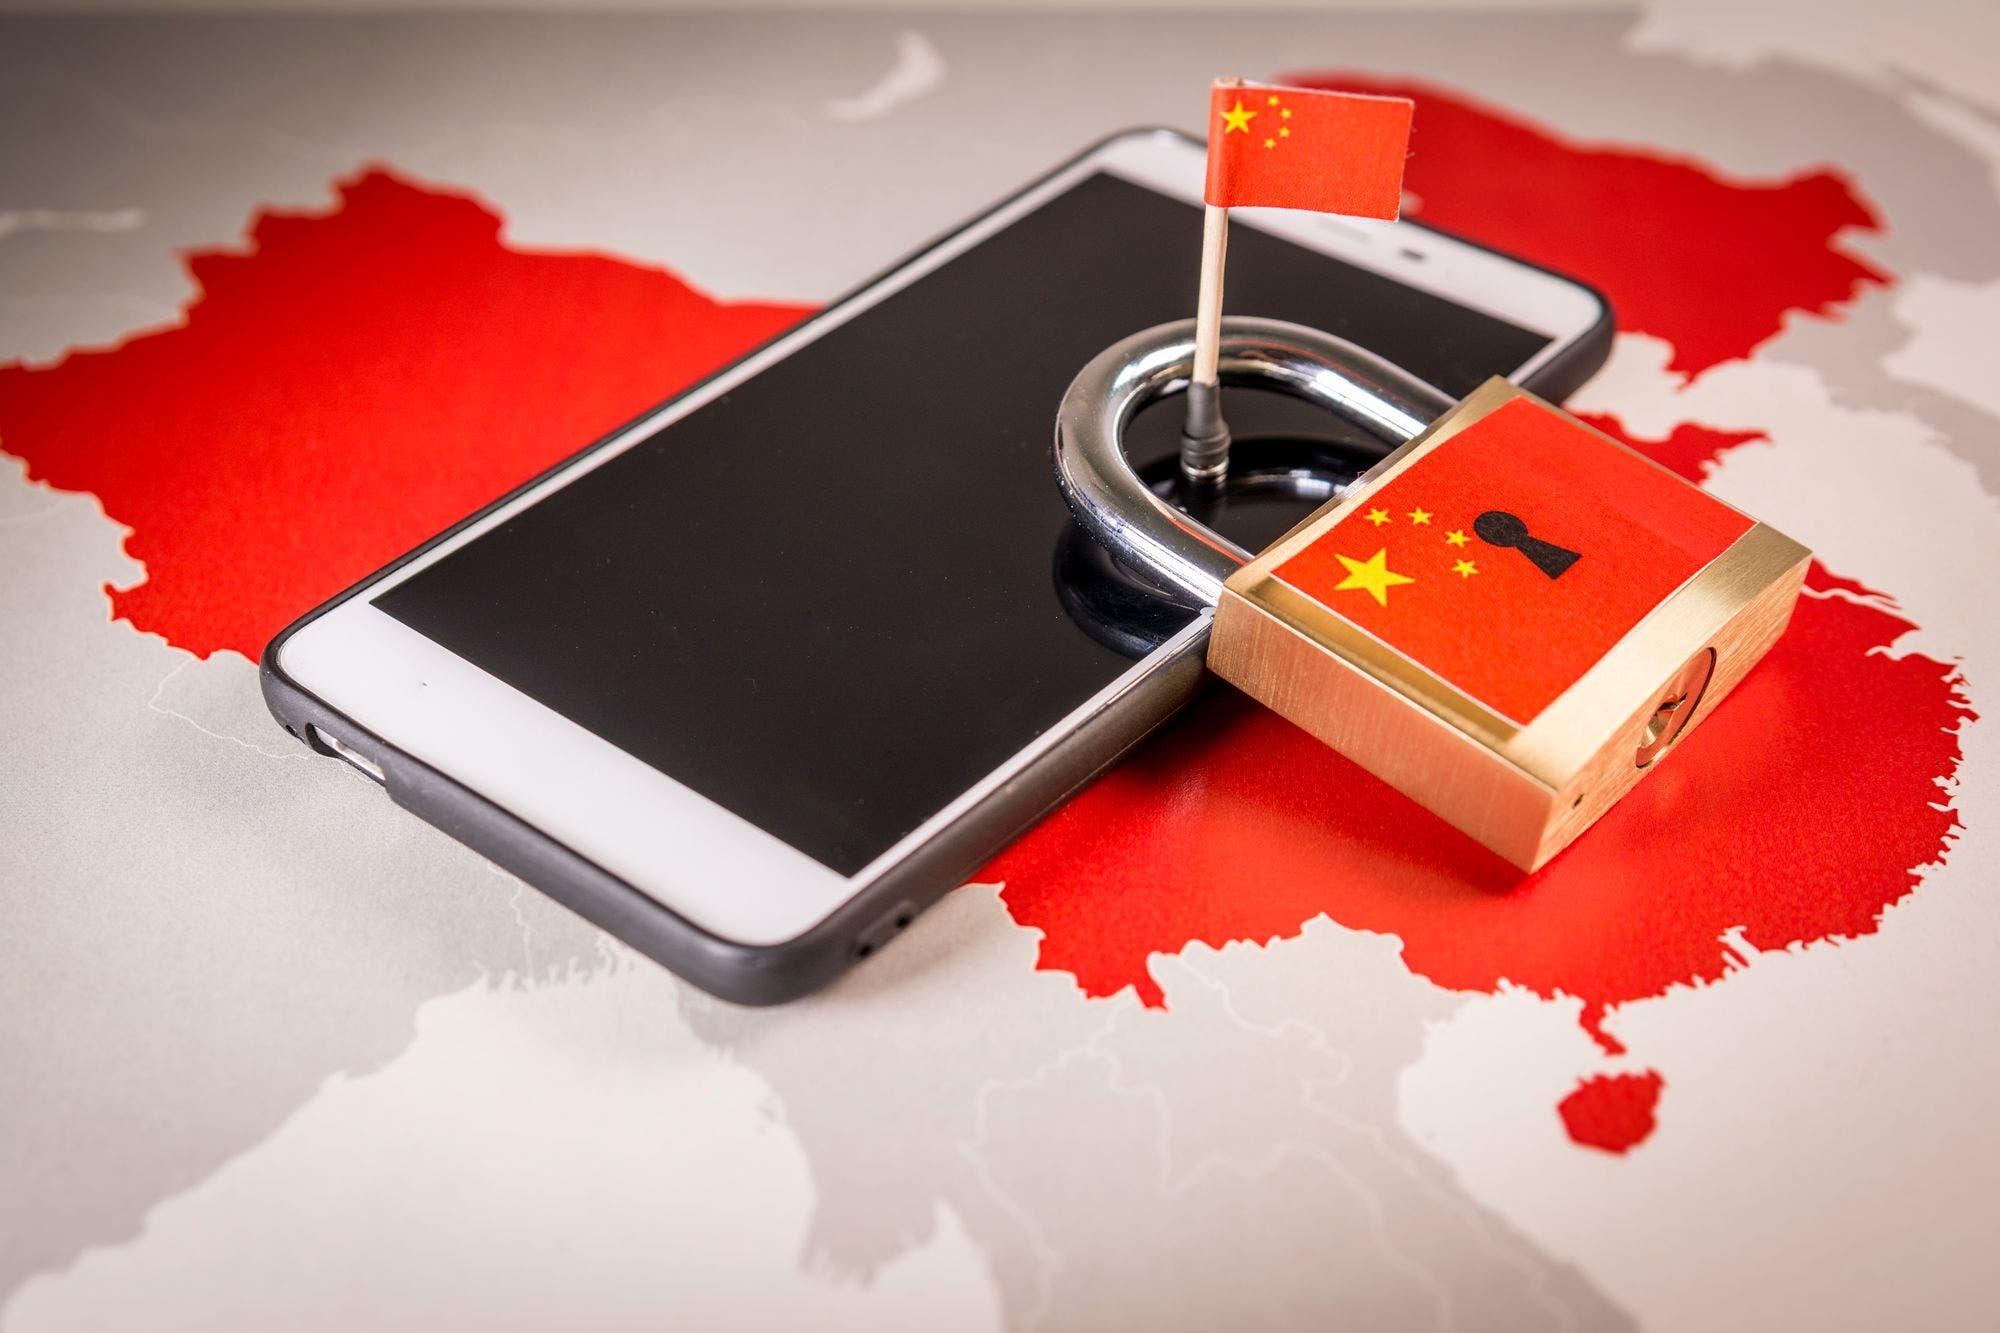 El ciberespacio occidental copia la internet paralela china